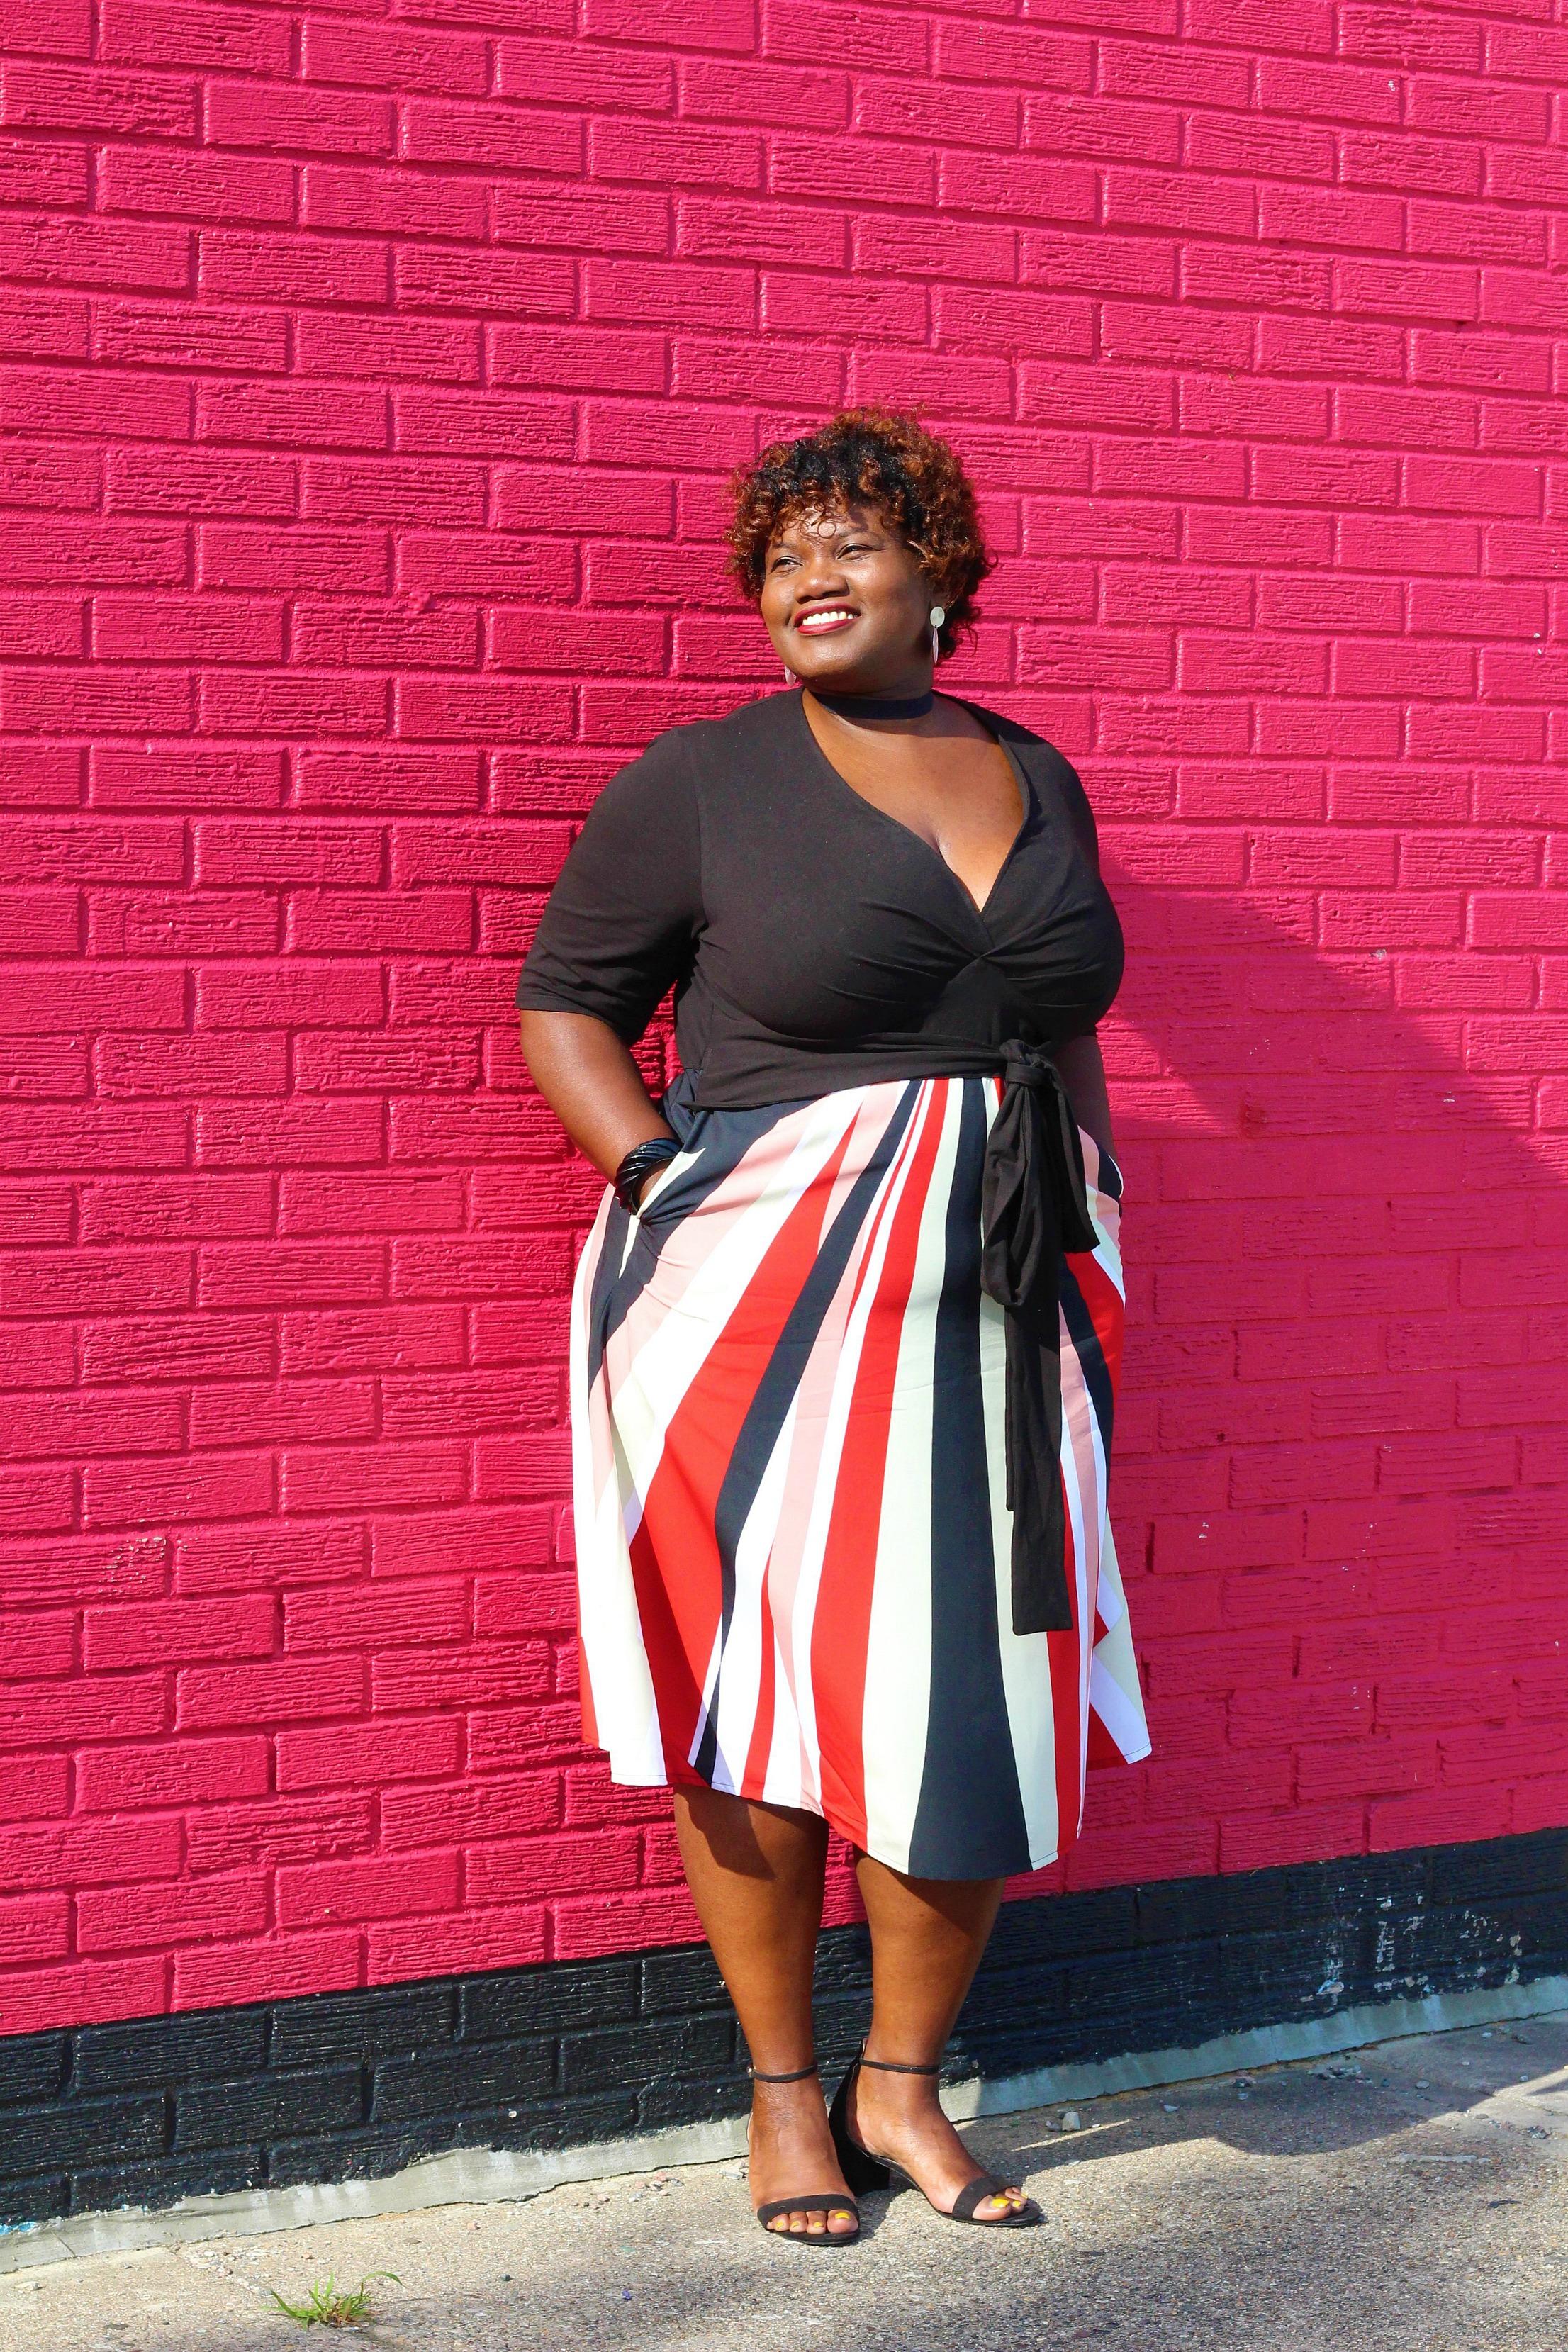 Fall Favorites: eShakti – Grown and Curvy Woman